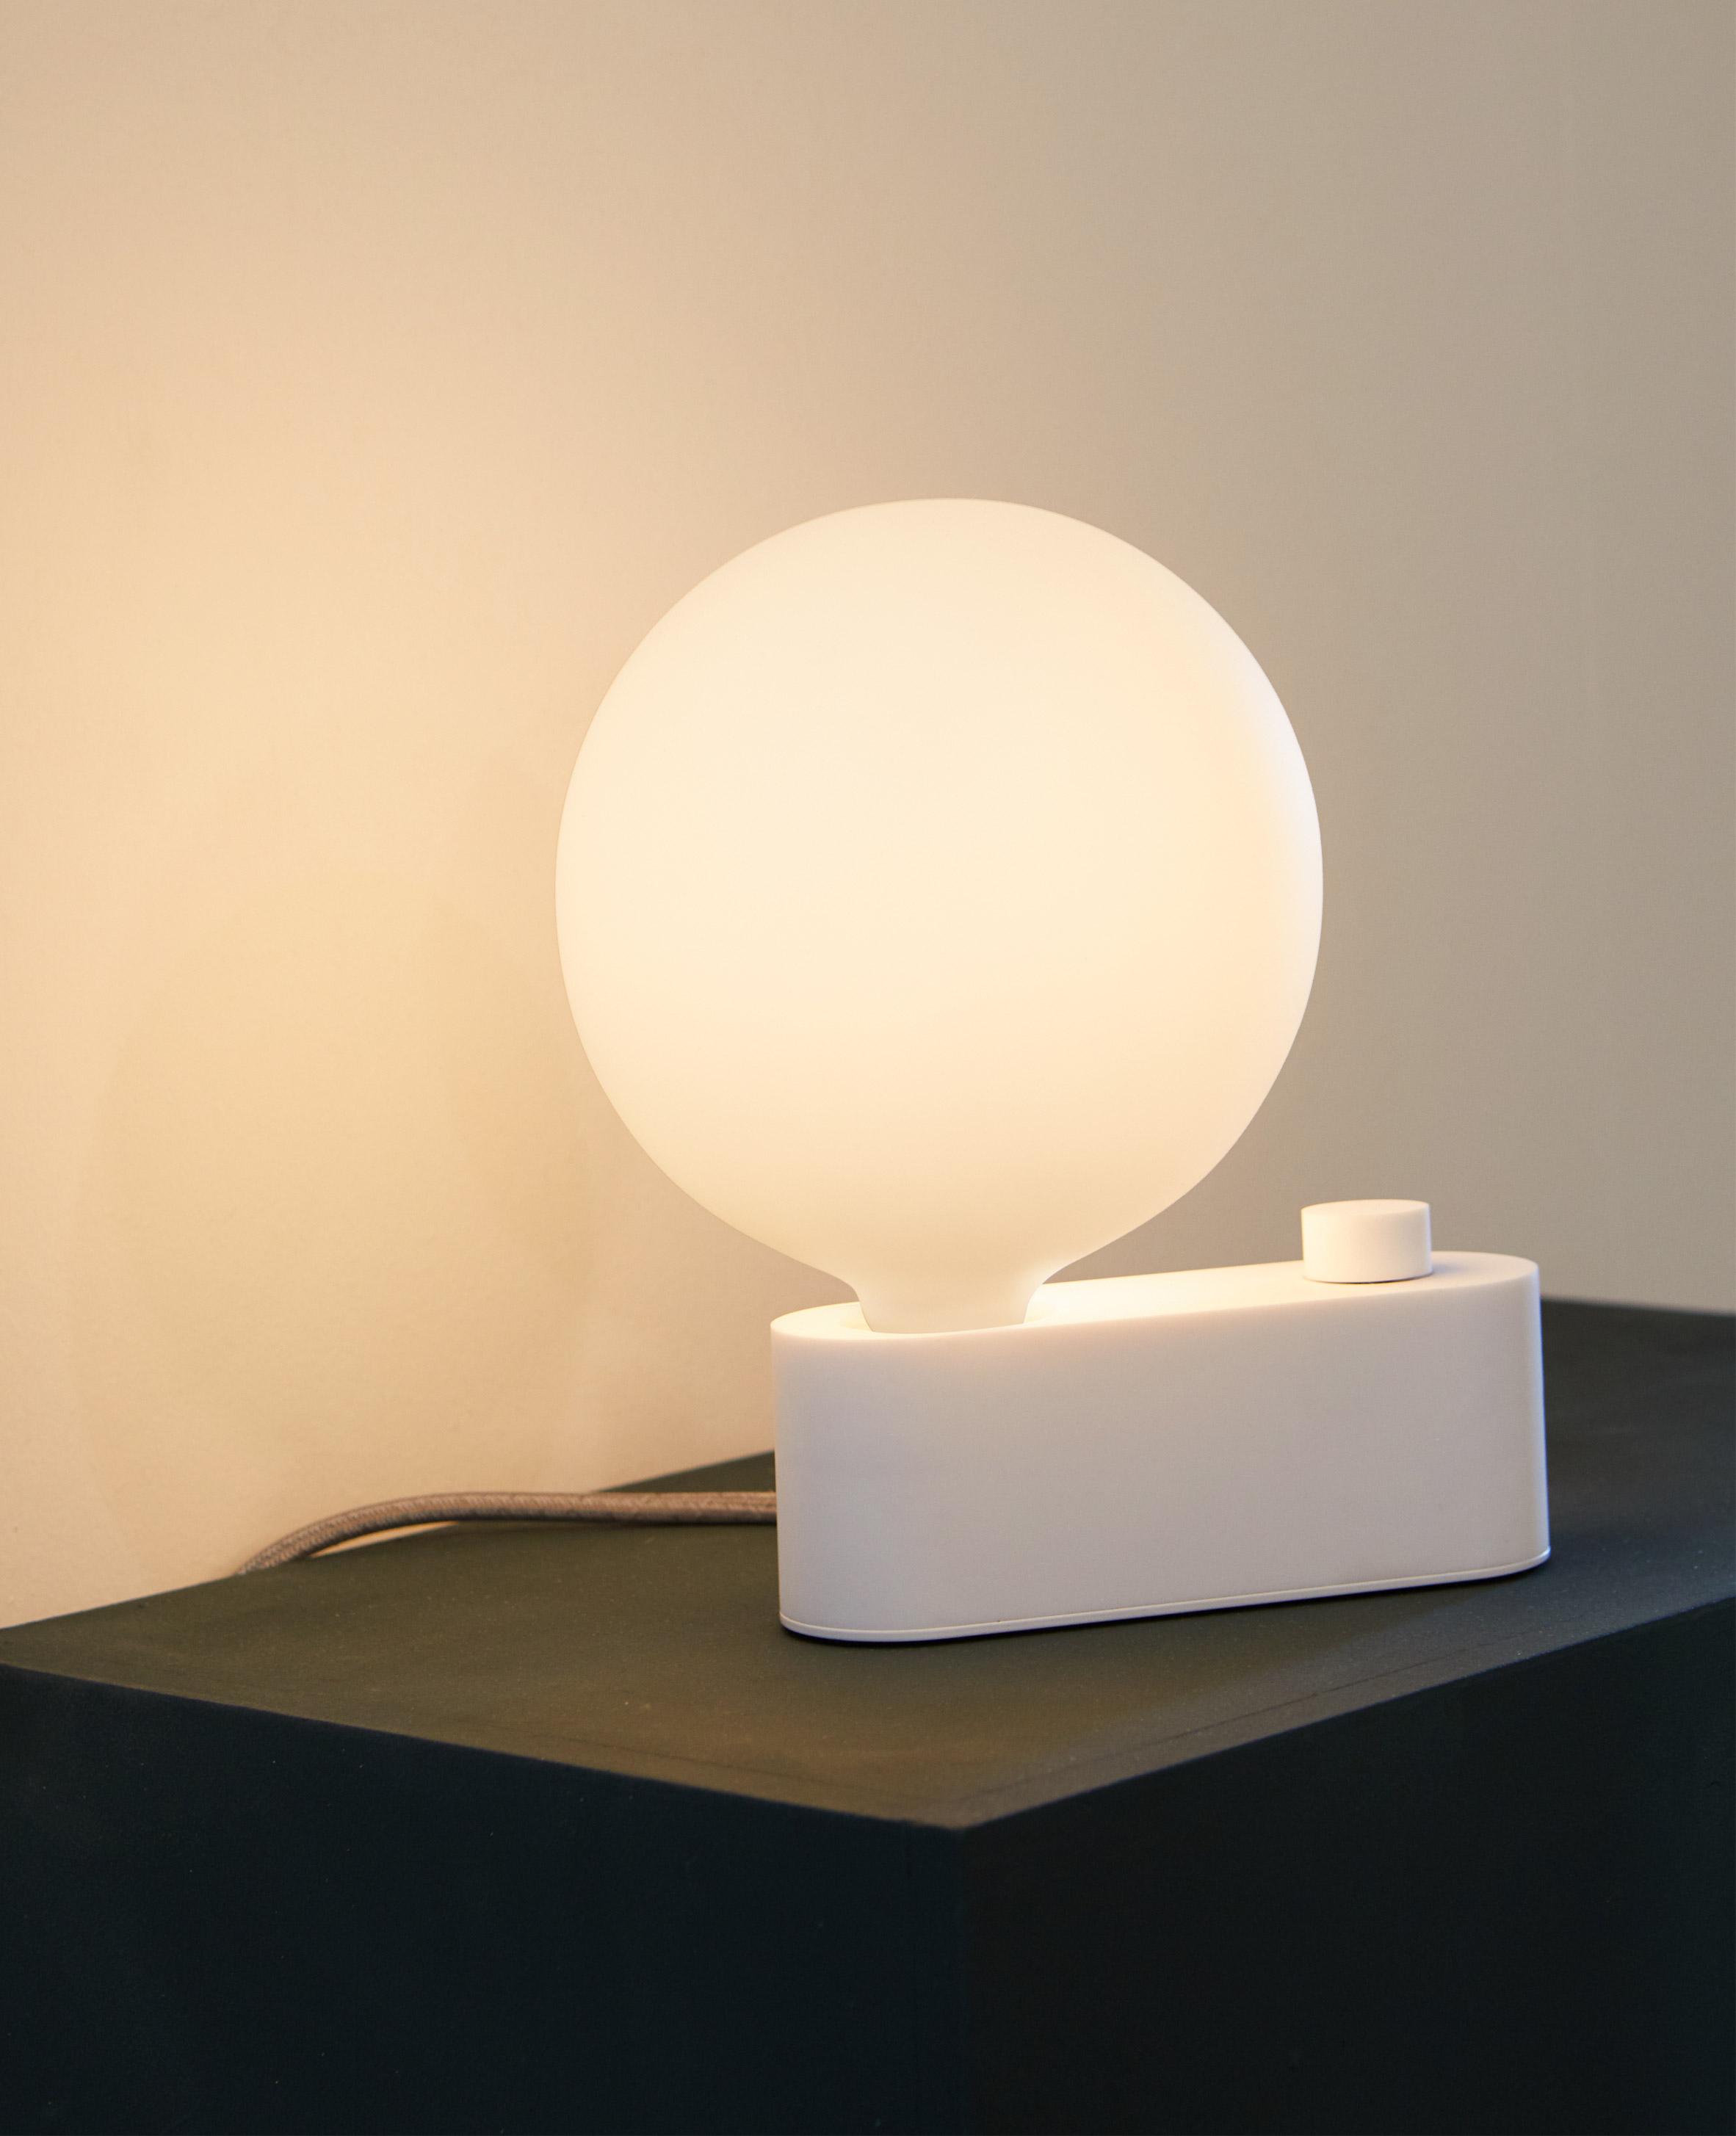 Tala's Alumina lighting range caters to today's growing rental market